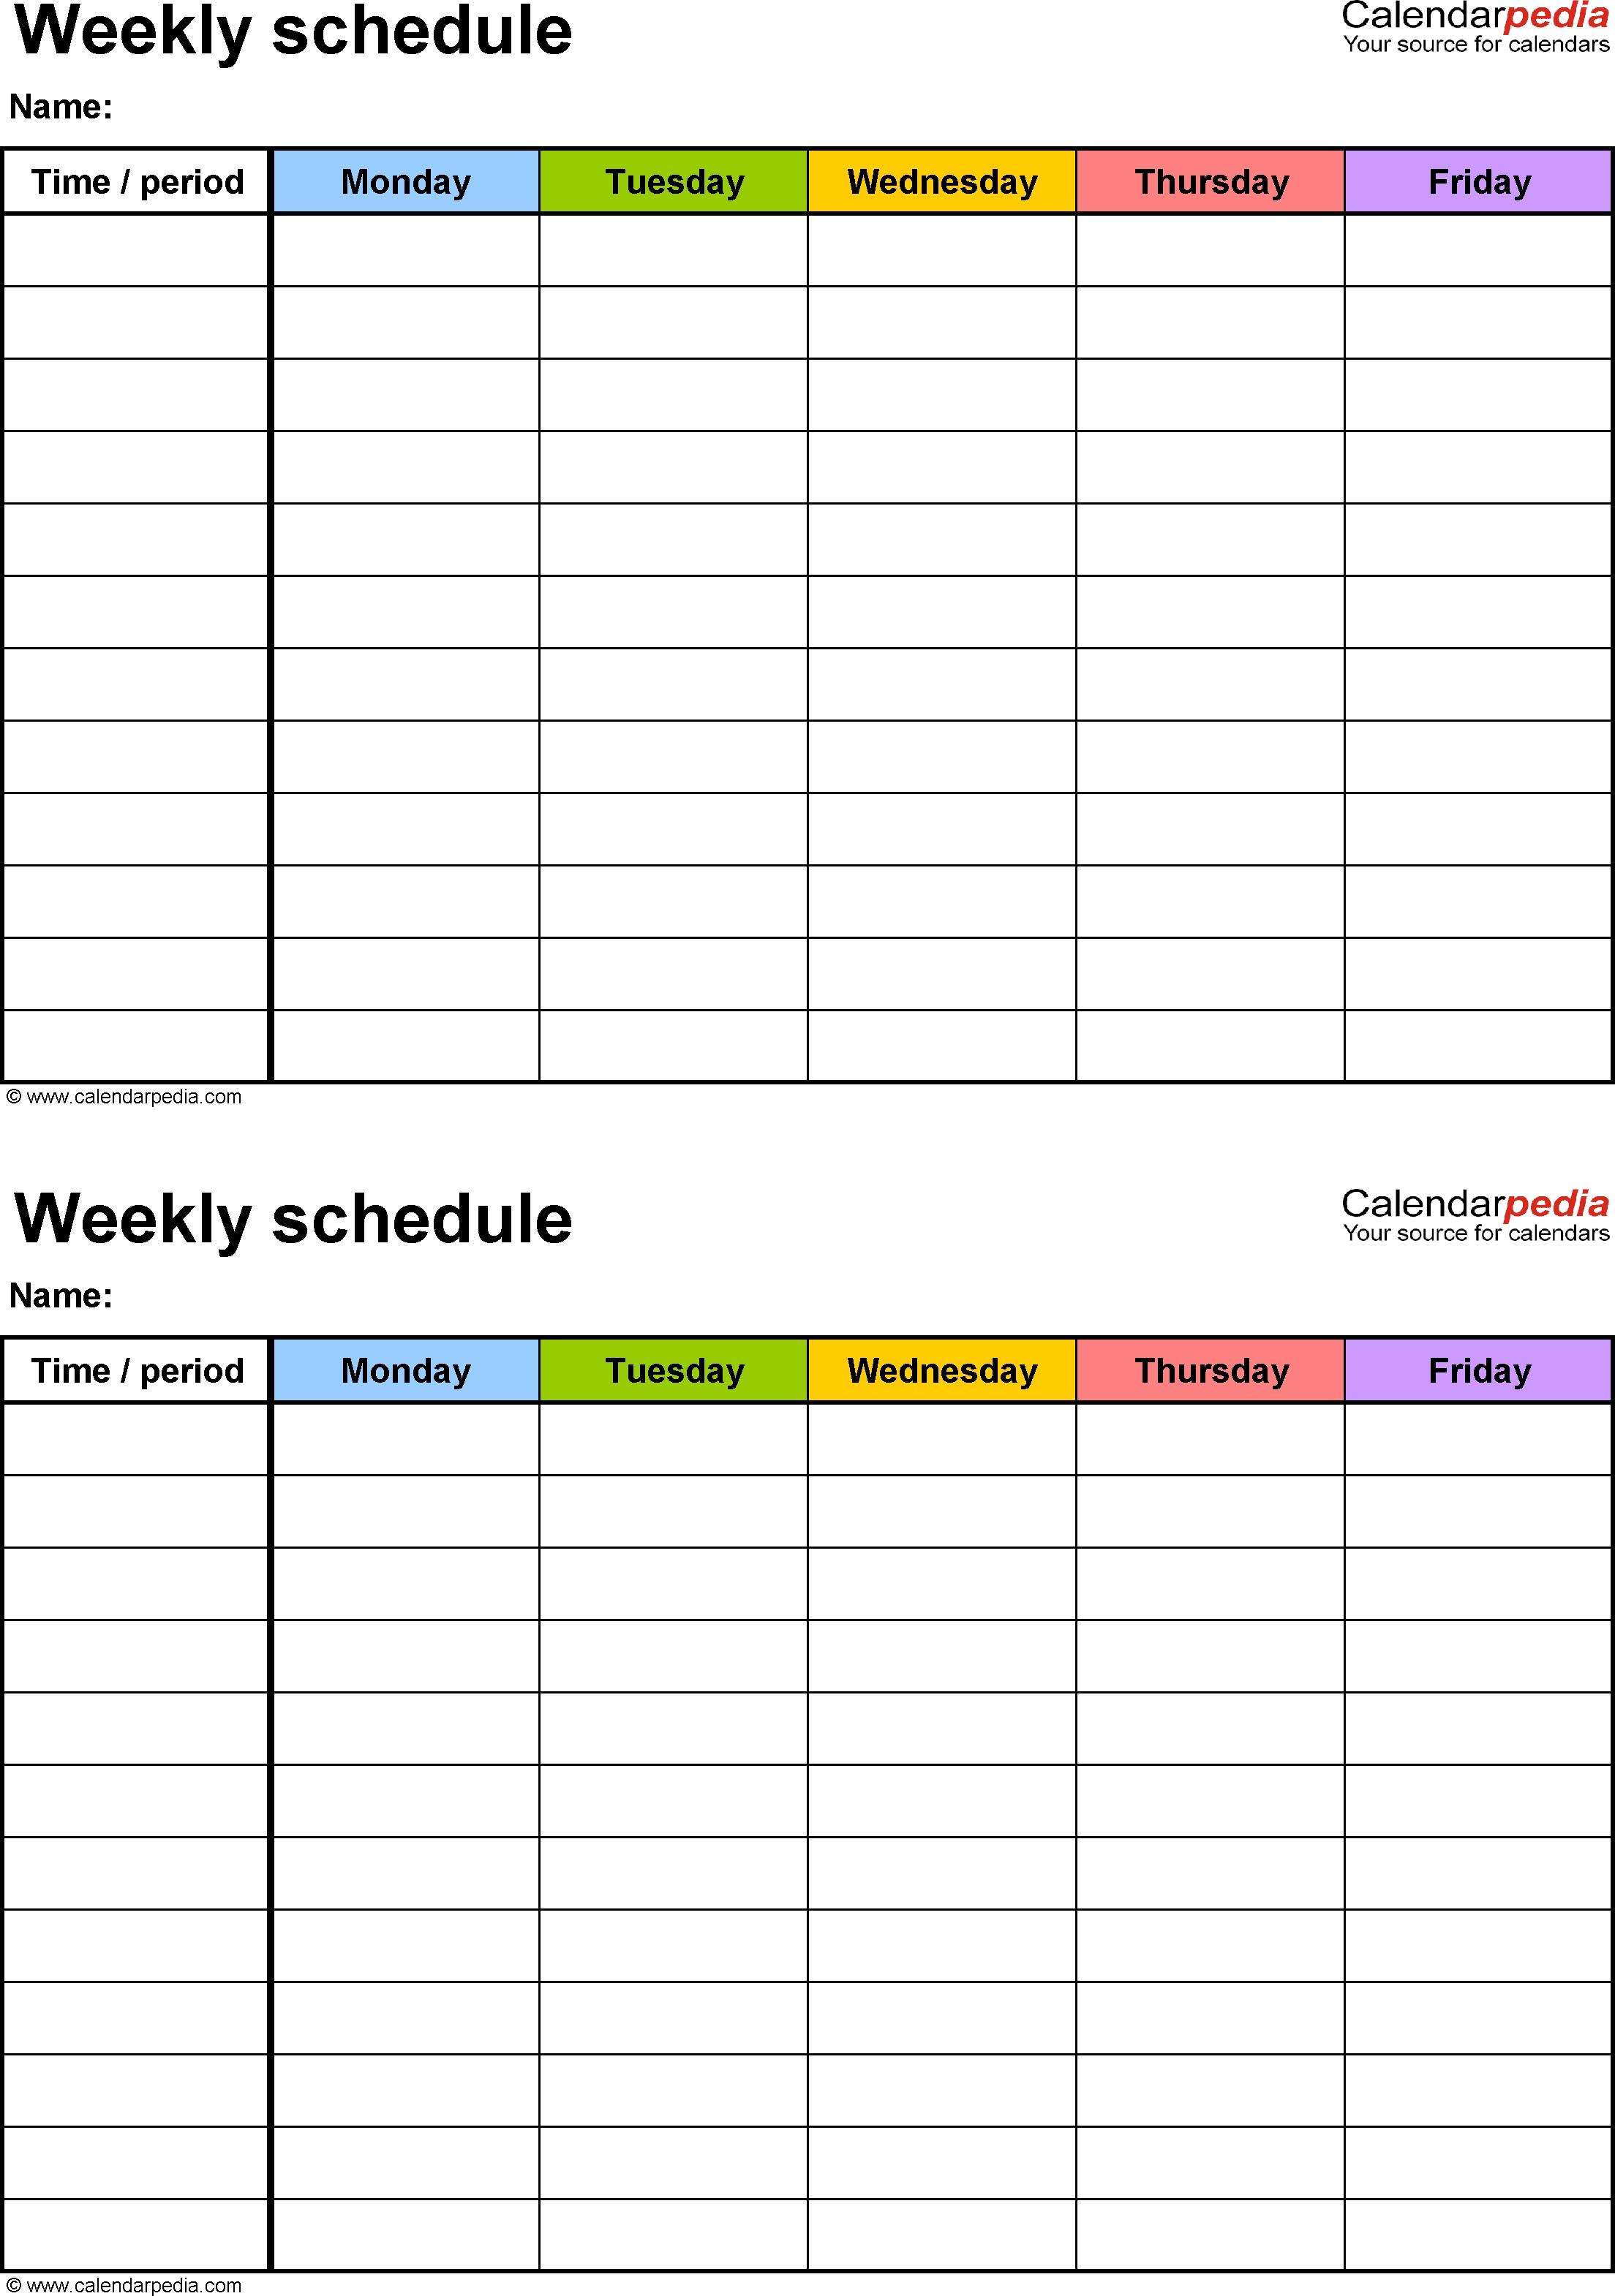 003 Template Ideas Week Schedule Dreaded Pdf One 2 Calendar regarding Time And Action Calendar Templates